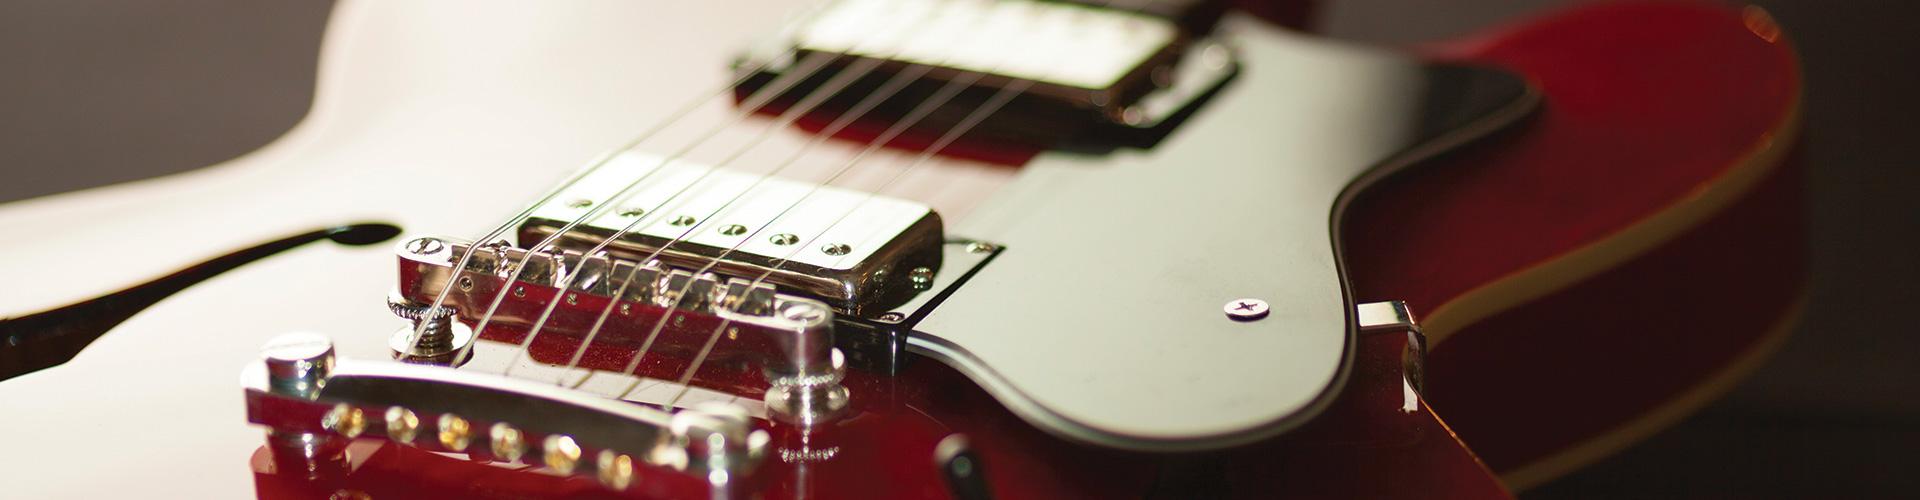 Pourquoi régler ma guitare ?